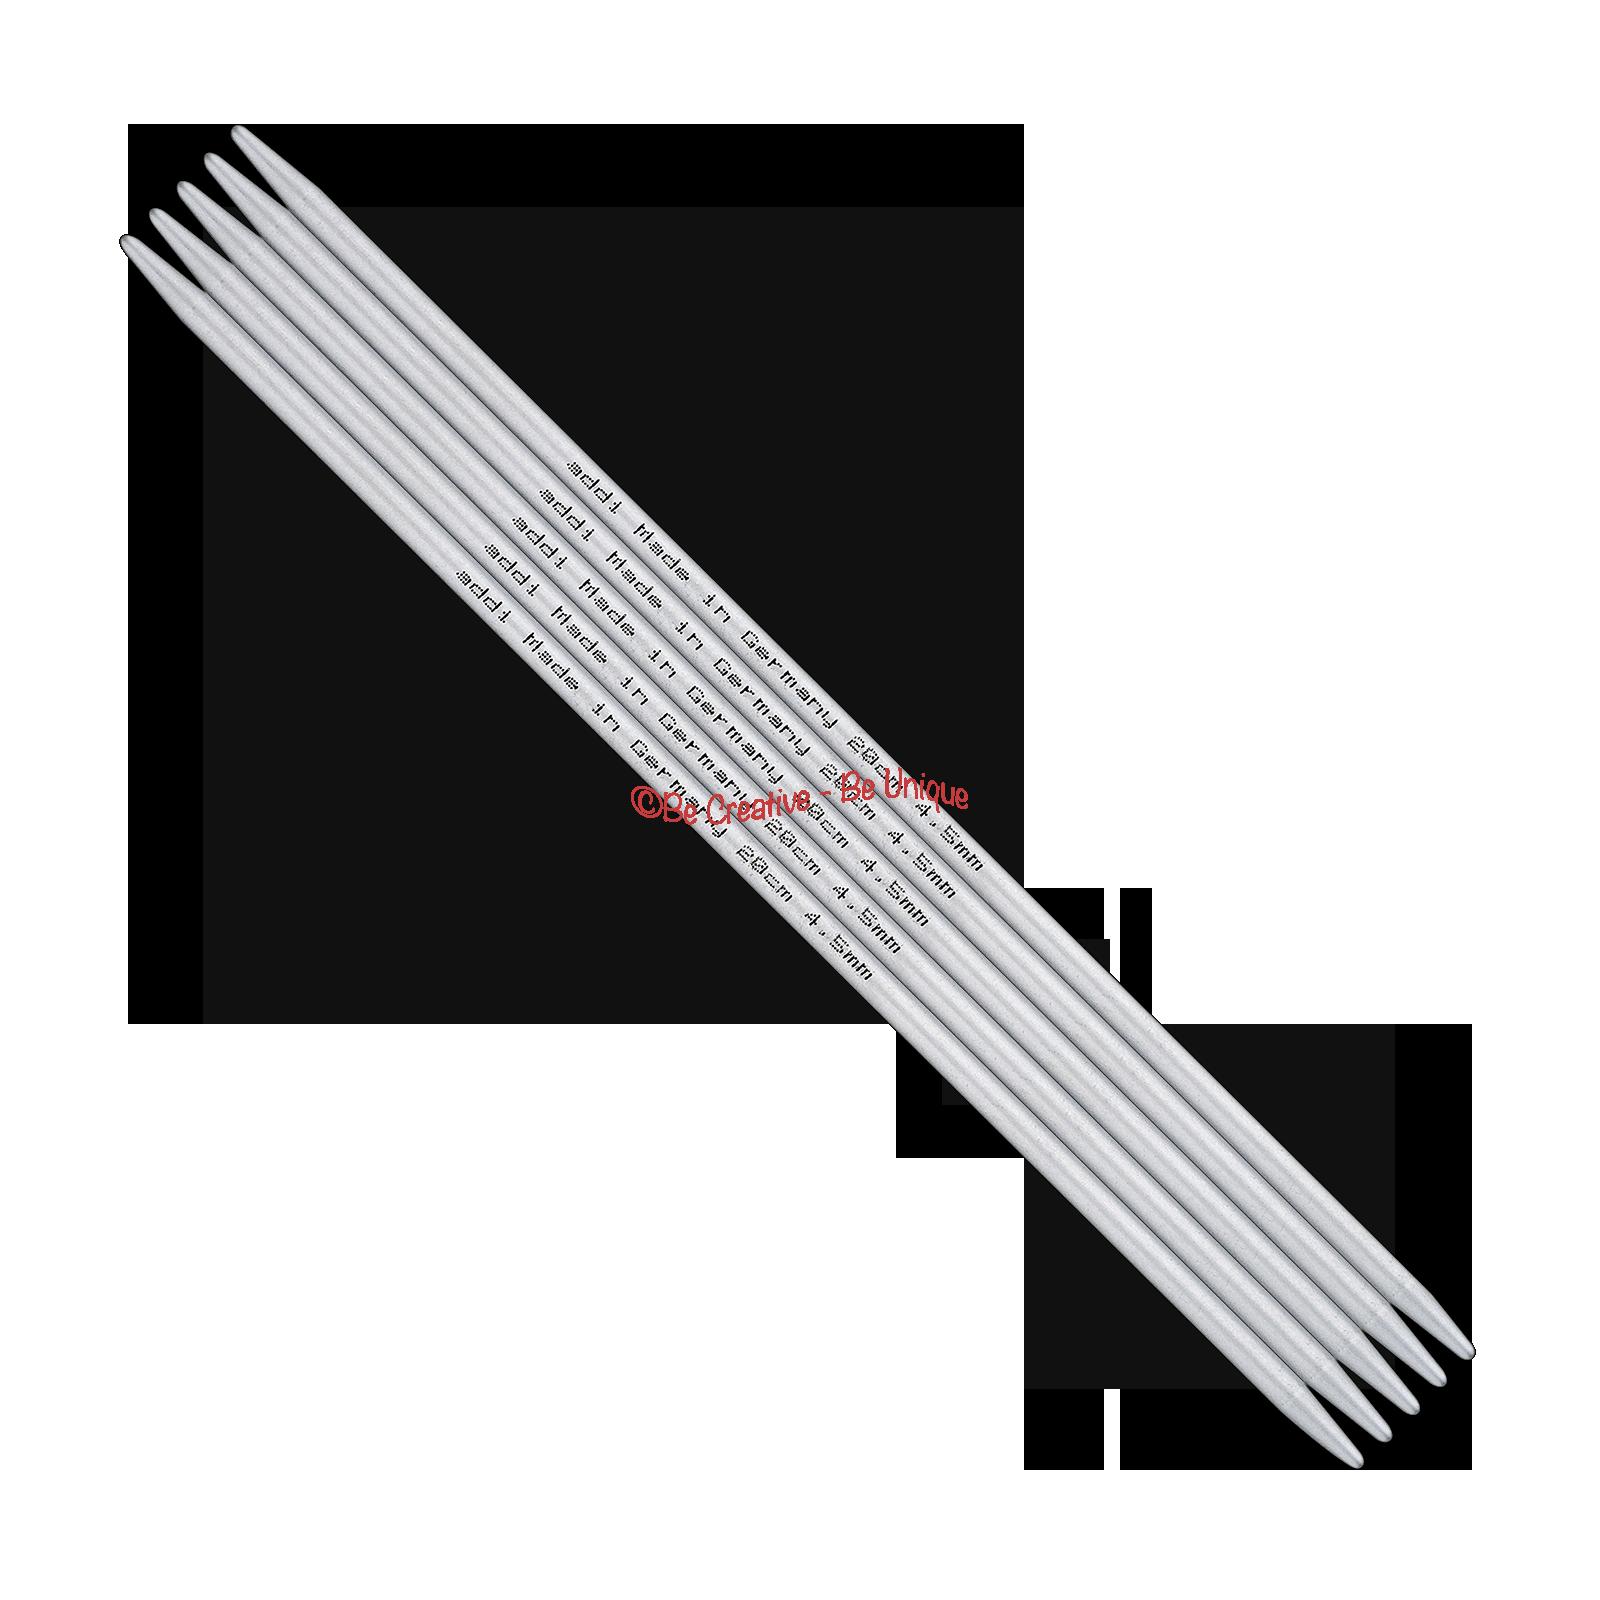 addi - Double Pointed Needles, Aluminium - Ø 2,0-8,0 mm | 10-40 cm